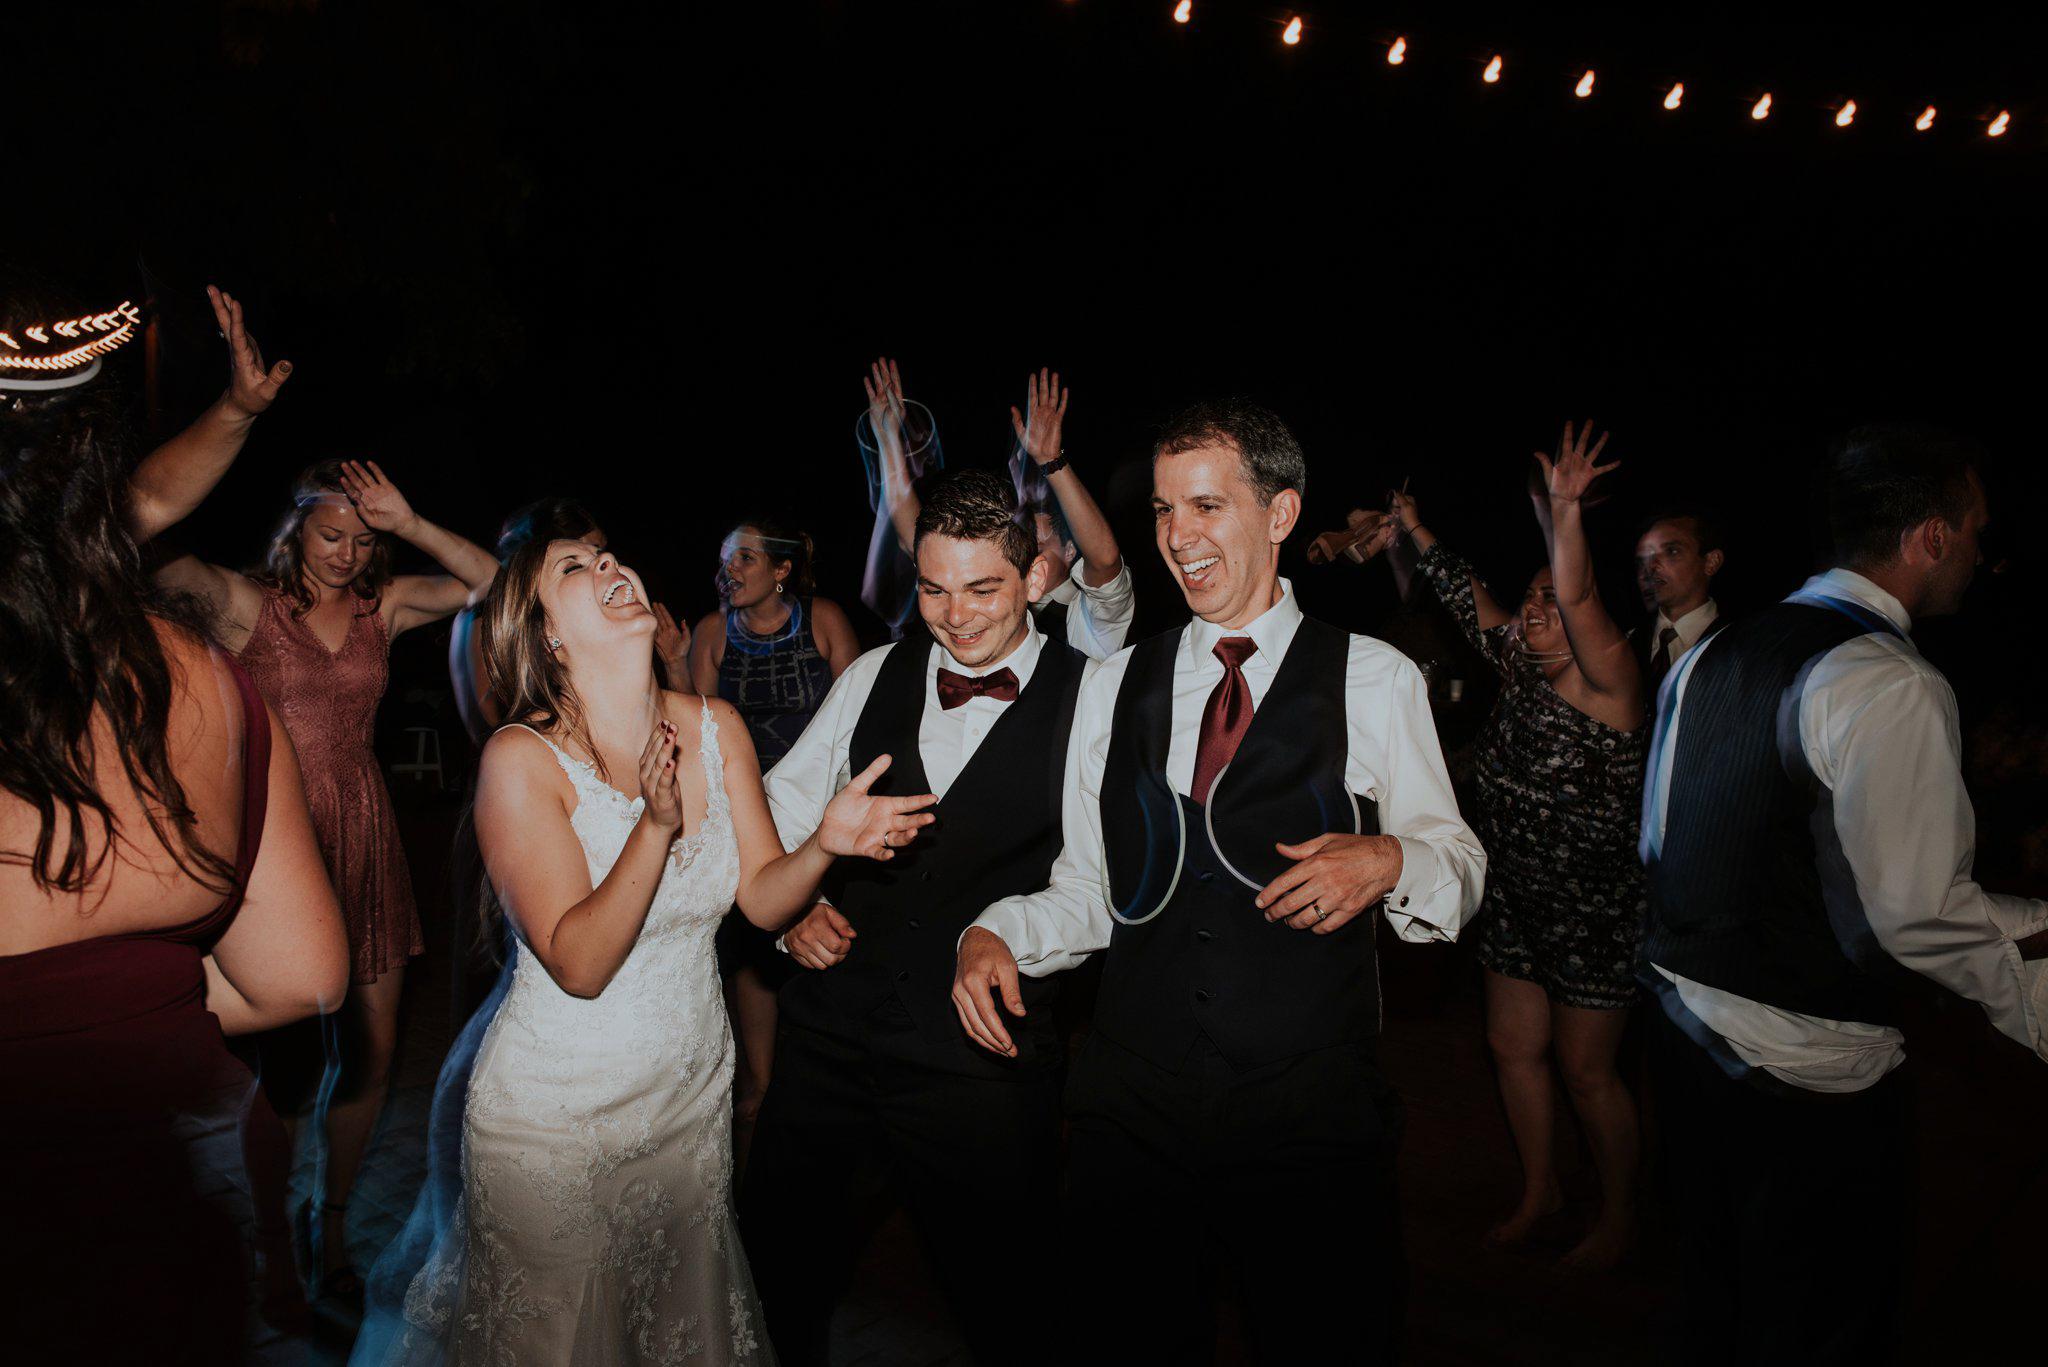 kristen-and-cody-the-kelley-farm-wedding-seattle-photographer-caitlyn-nikula-126.jpg